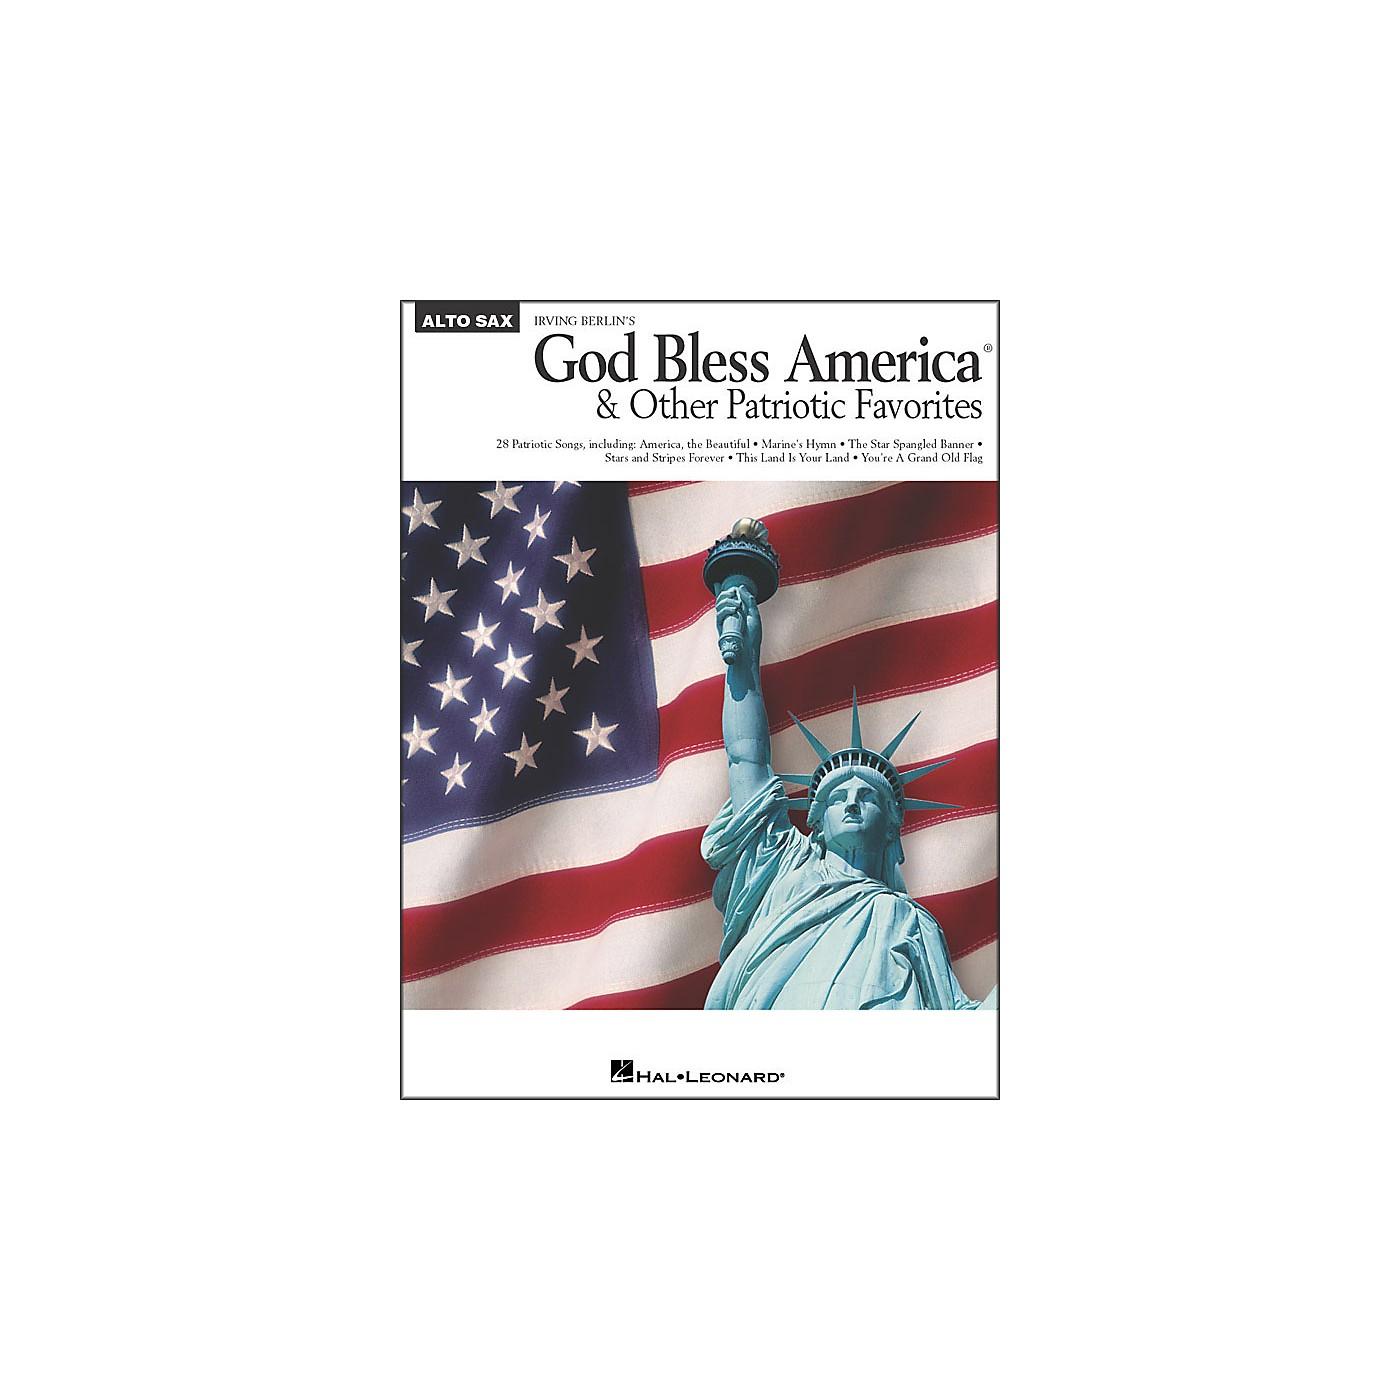 Hal Leonard God Bless America & Other Patriotic Favorites - Alto Sax thumbnail